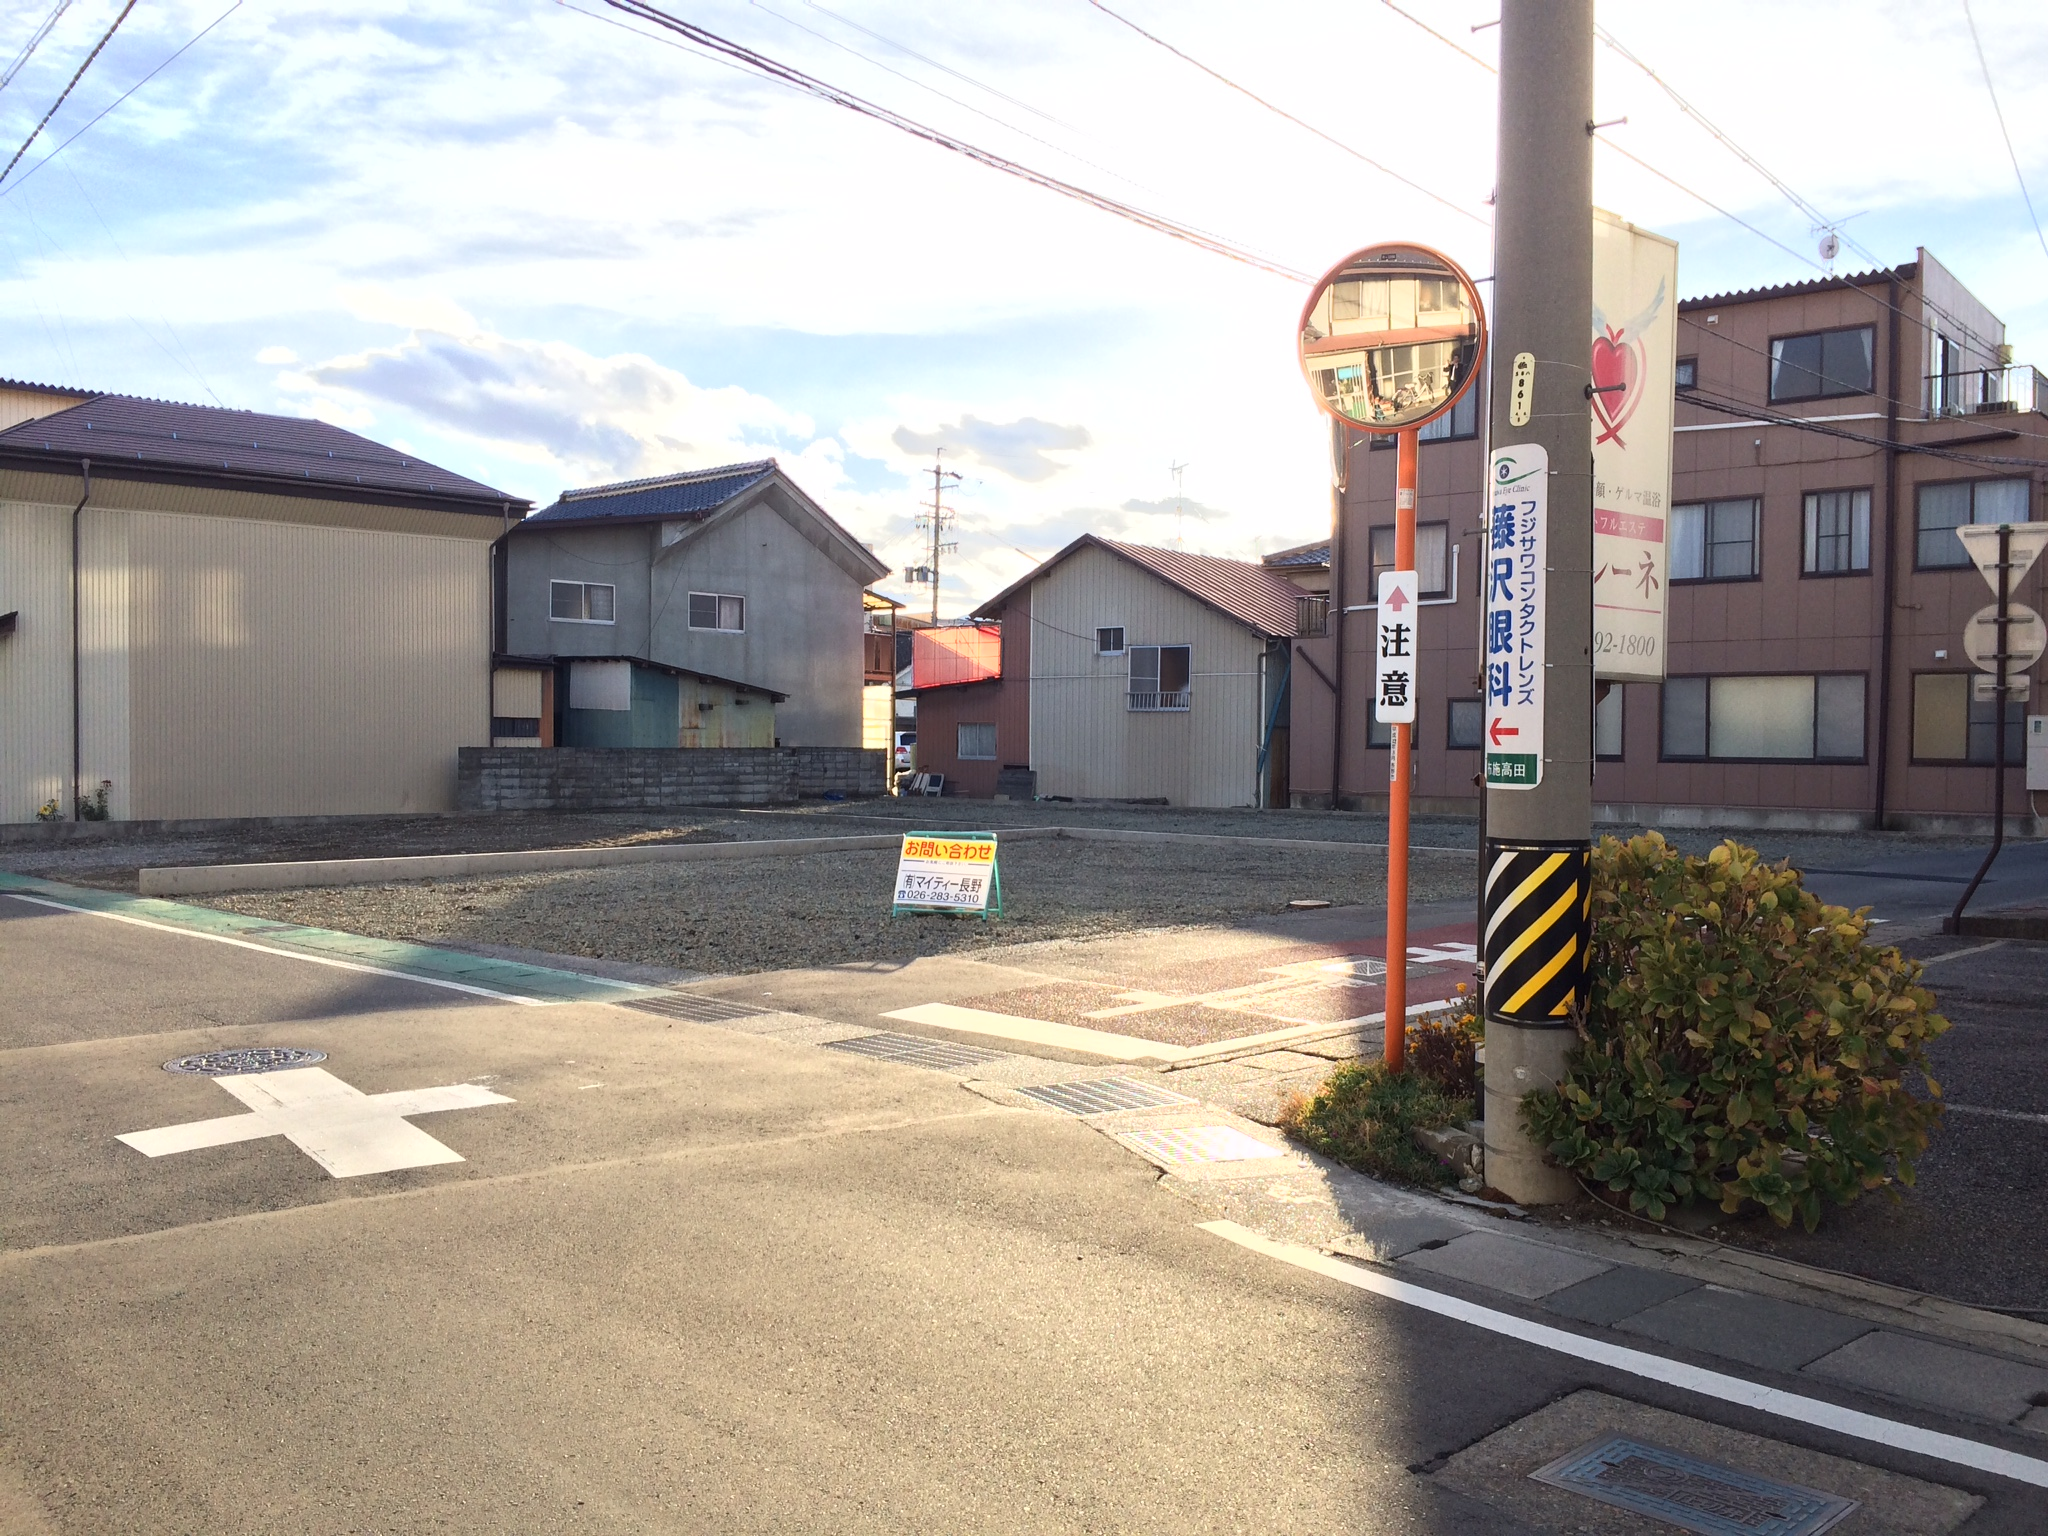 http://www.kitano-sumai.jp/blog/01af451fea76130605c9bad3e30e56bb42755ee4b2.jpg